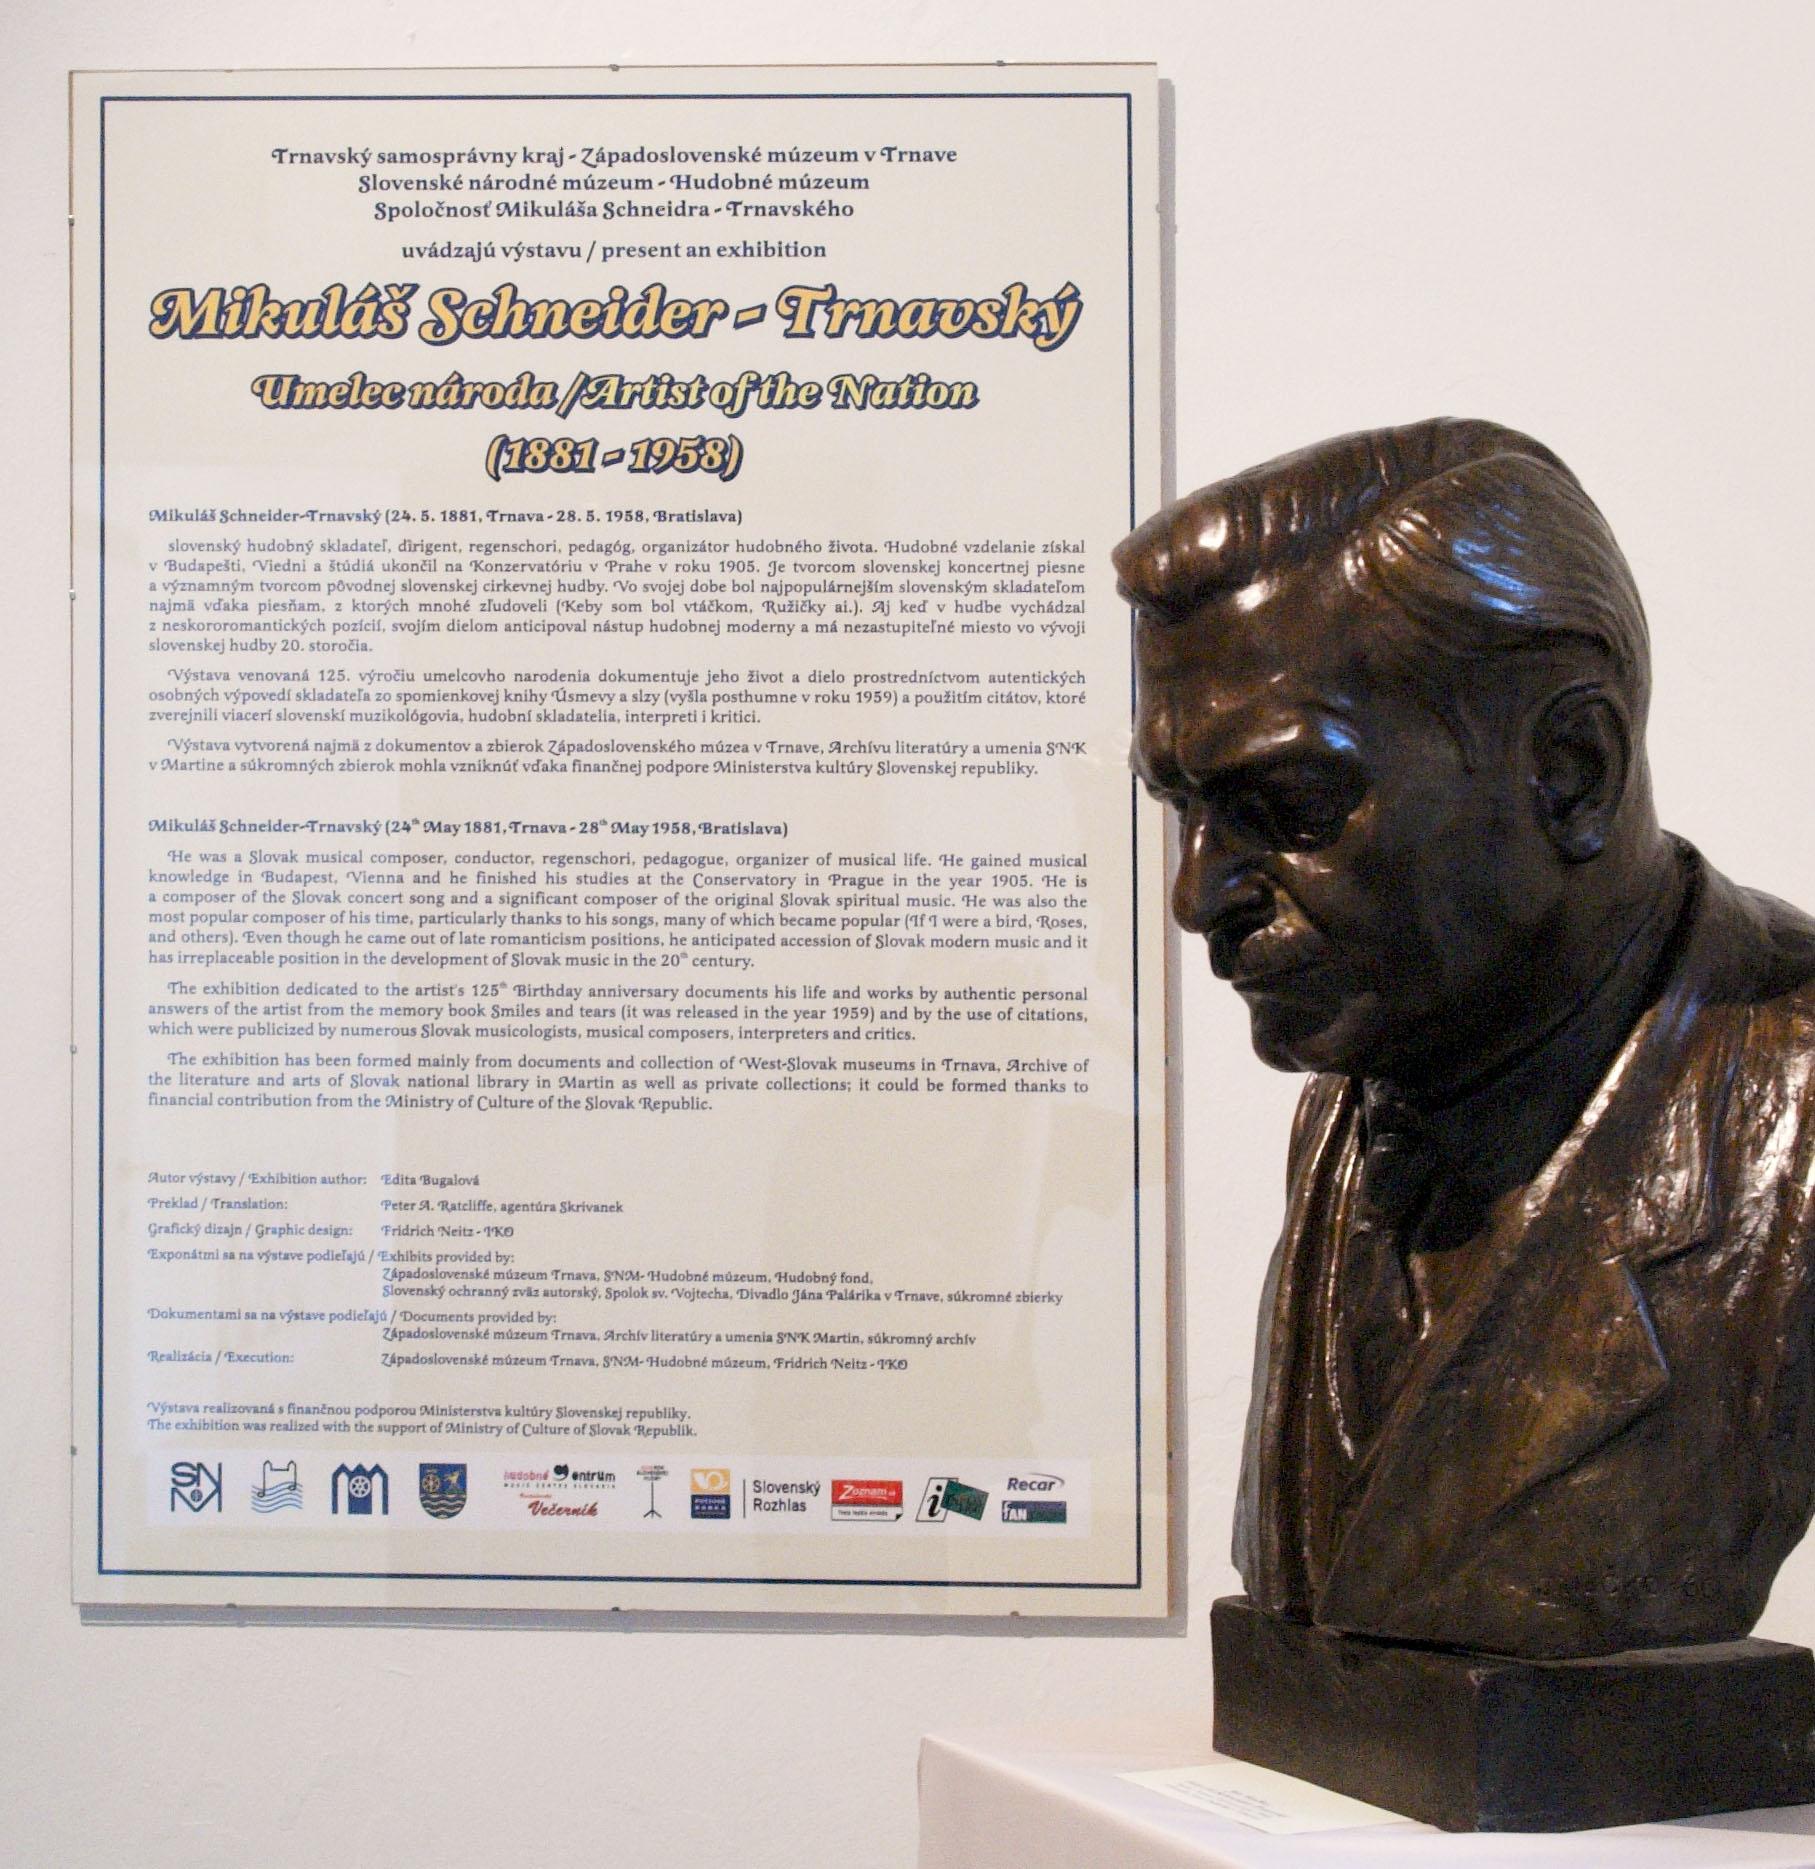 Bronze bust of M. Schneider-Trnavský at [[Bratislava Castle